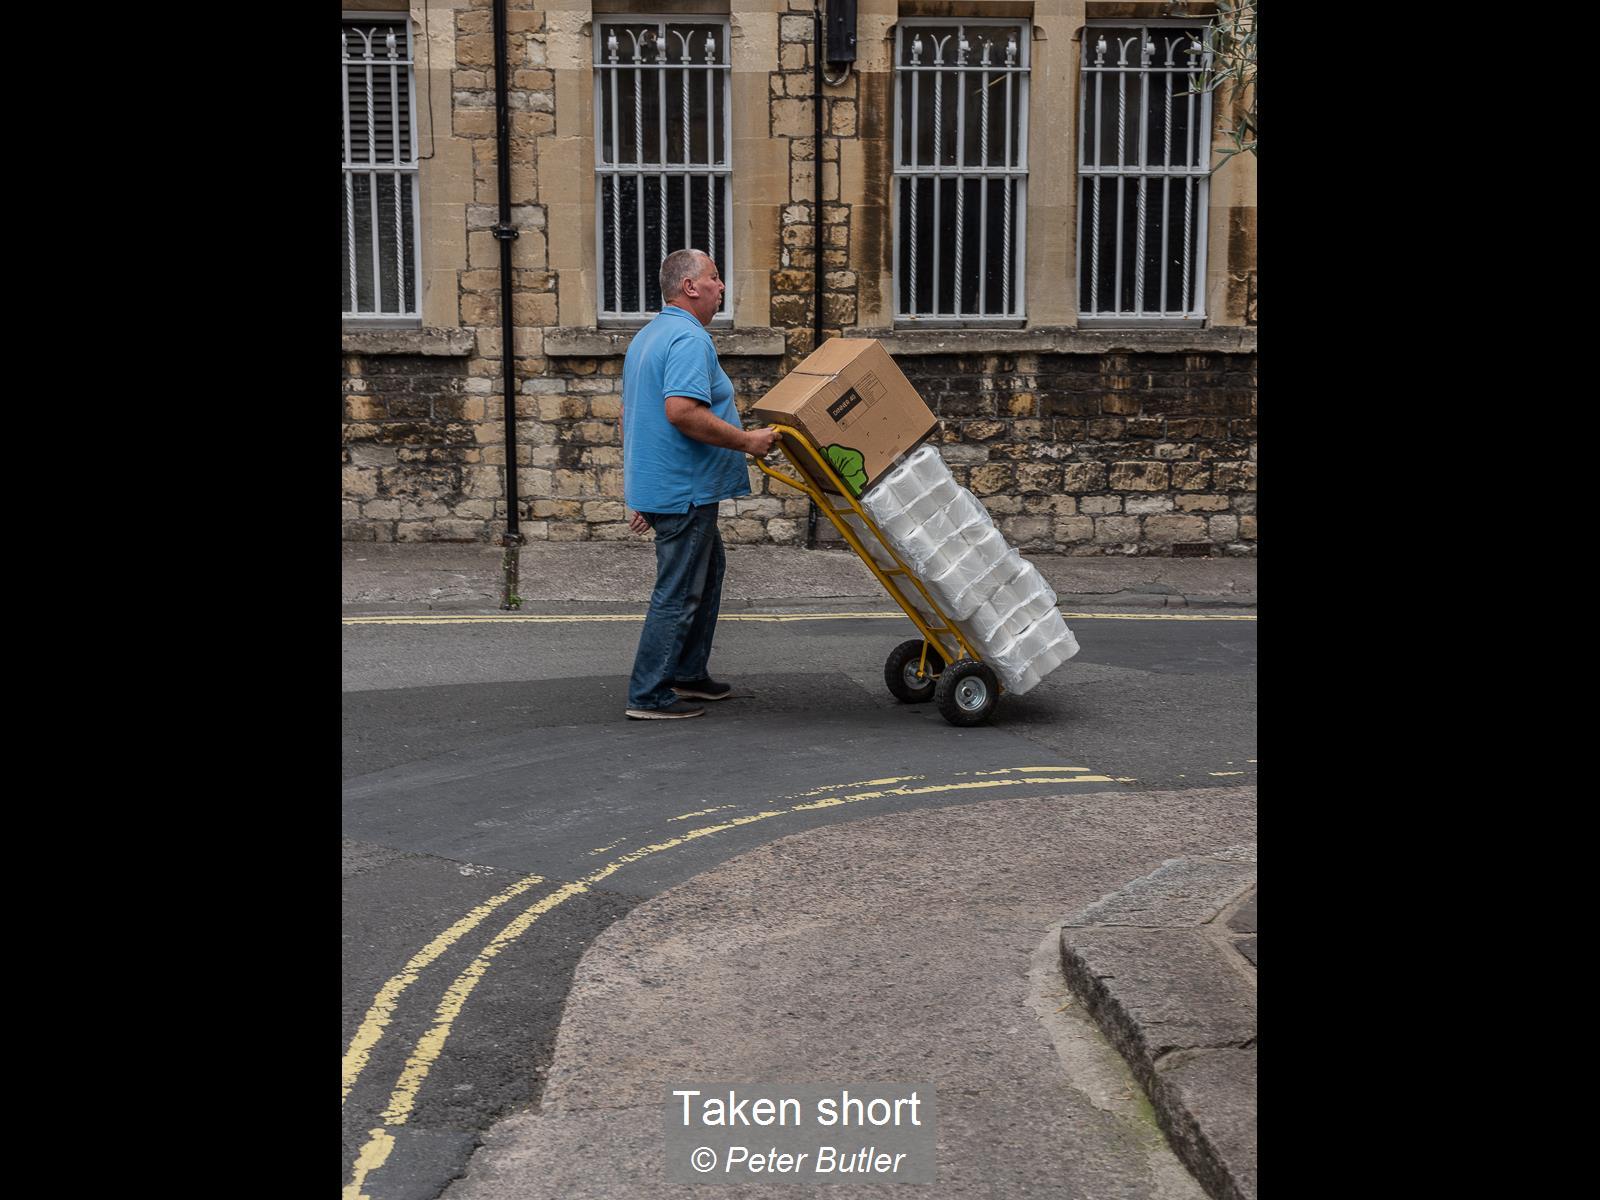 Peter Butler_Taken short_None